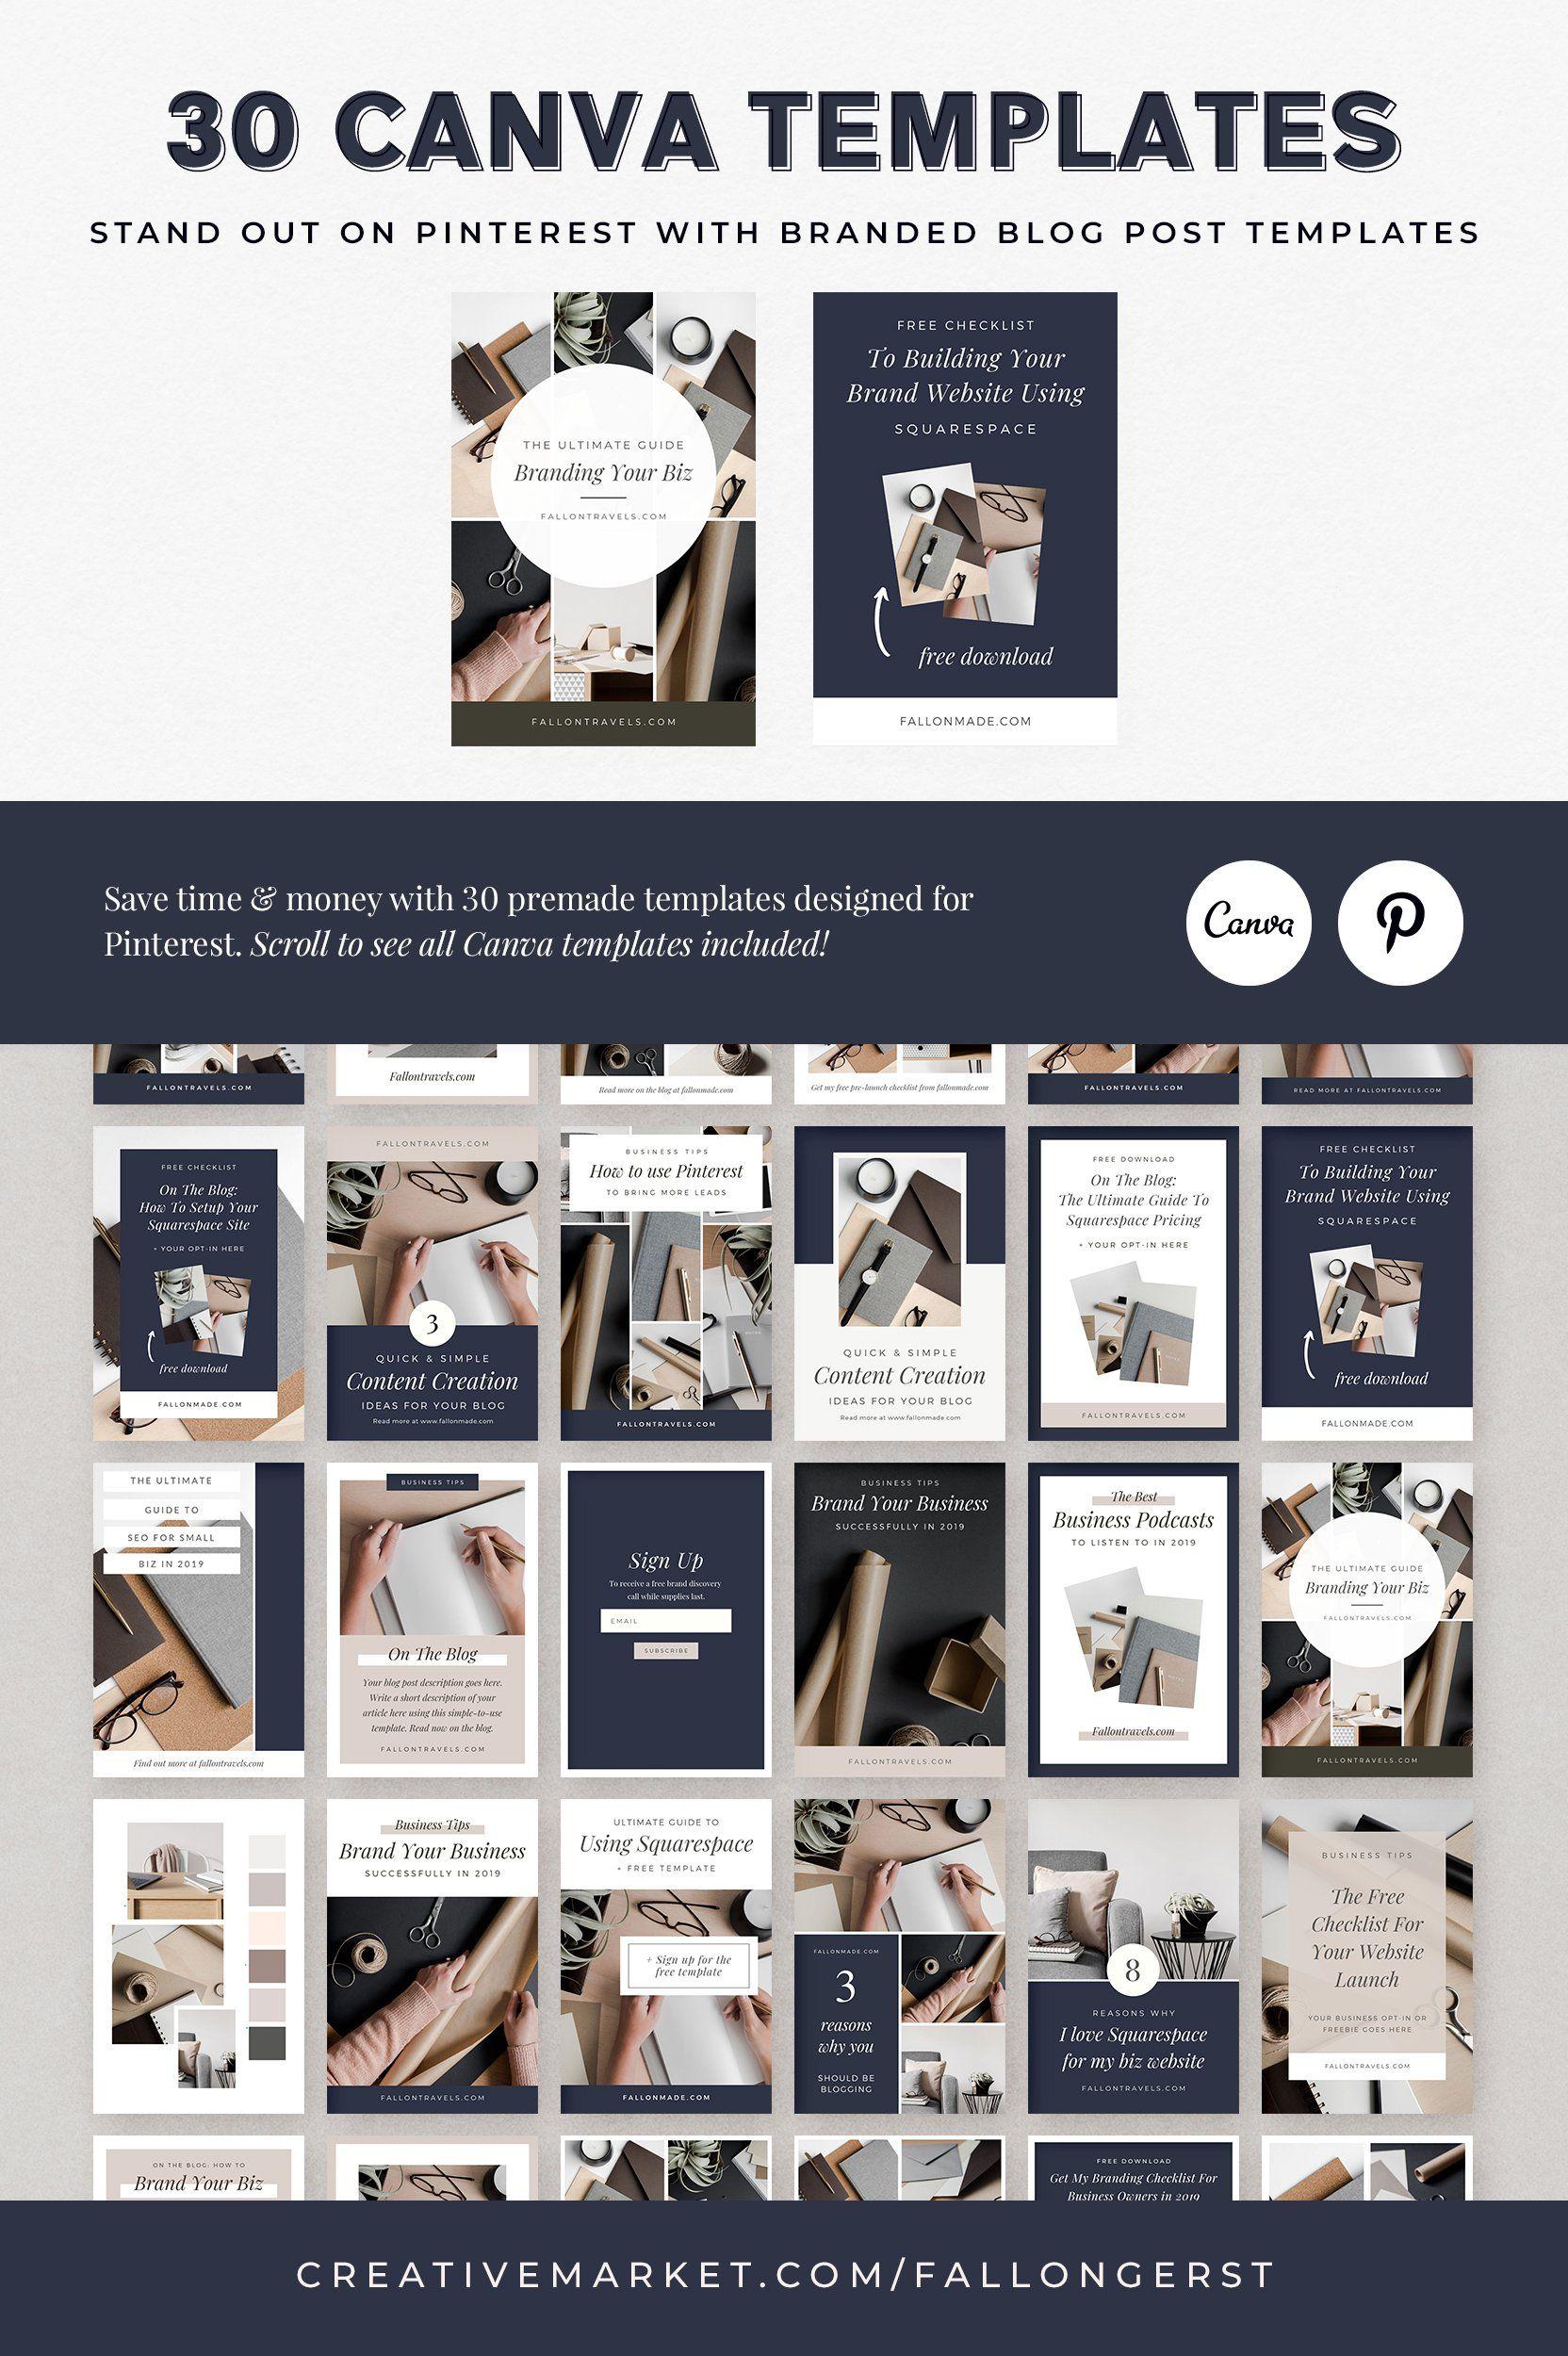 20+ Pinterest Templates for Canva   Pinterest templates, Business ...